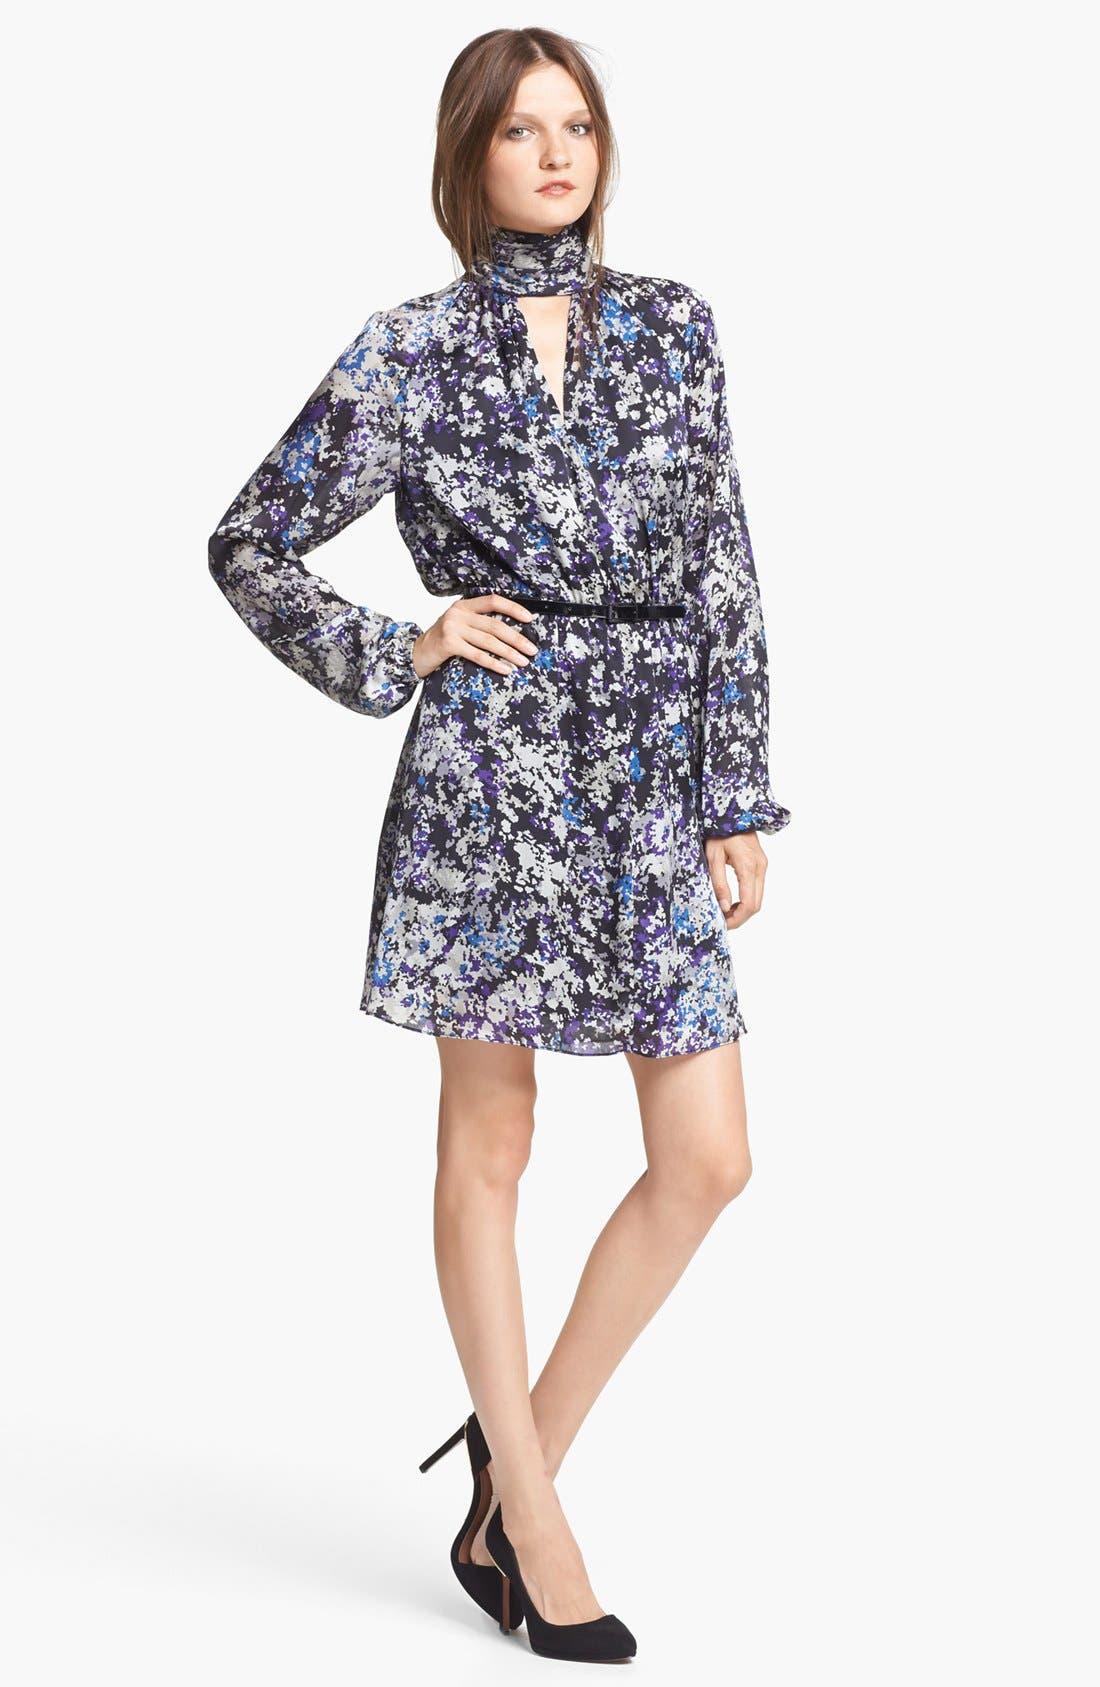 Main Image - Rachel Zoe 'Maldives' Print Satin Blouson Dress